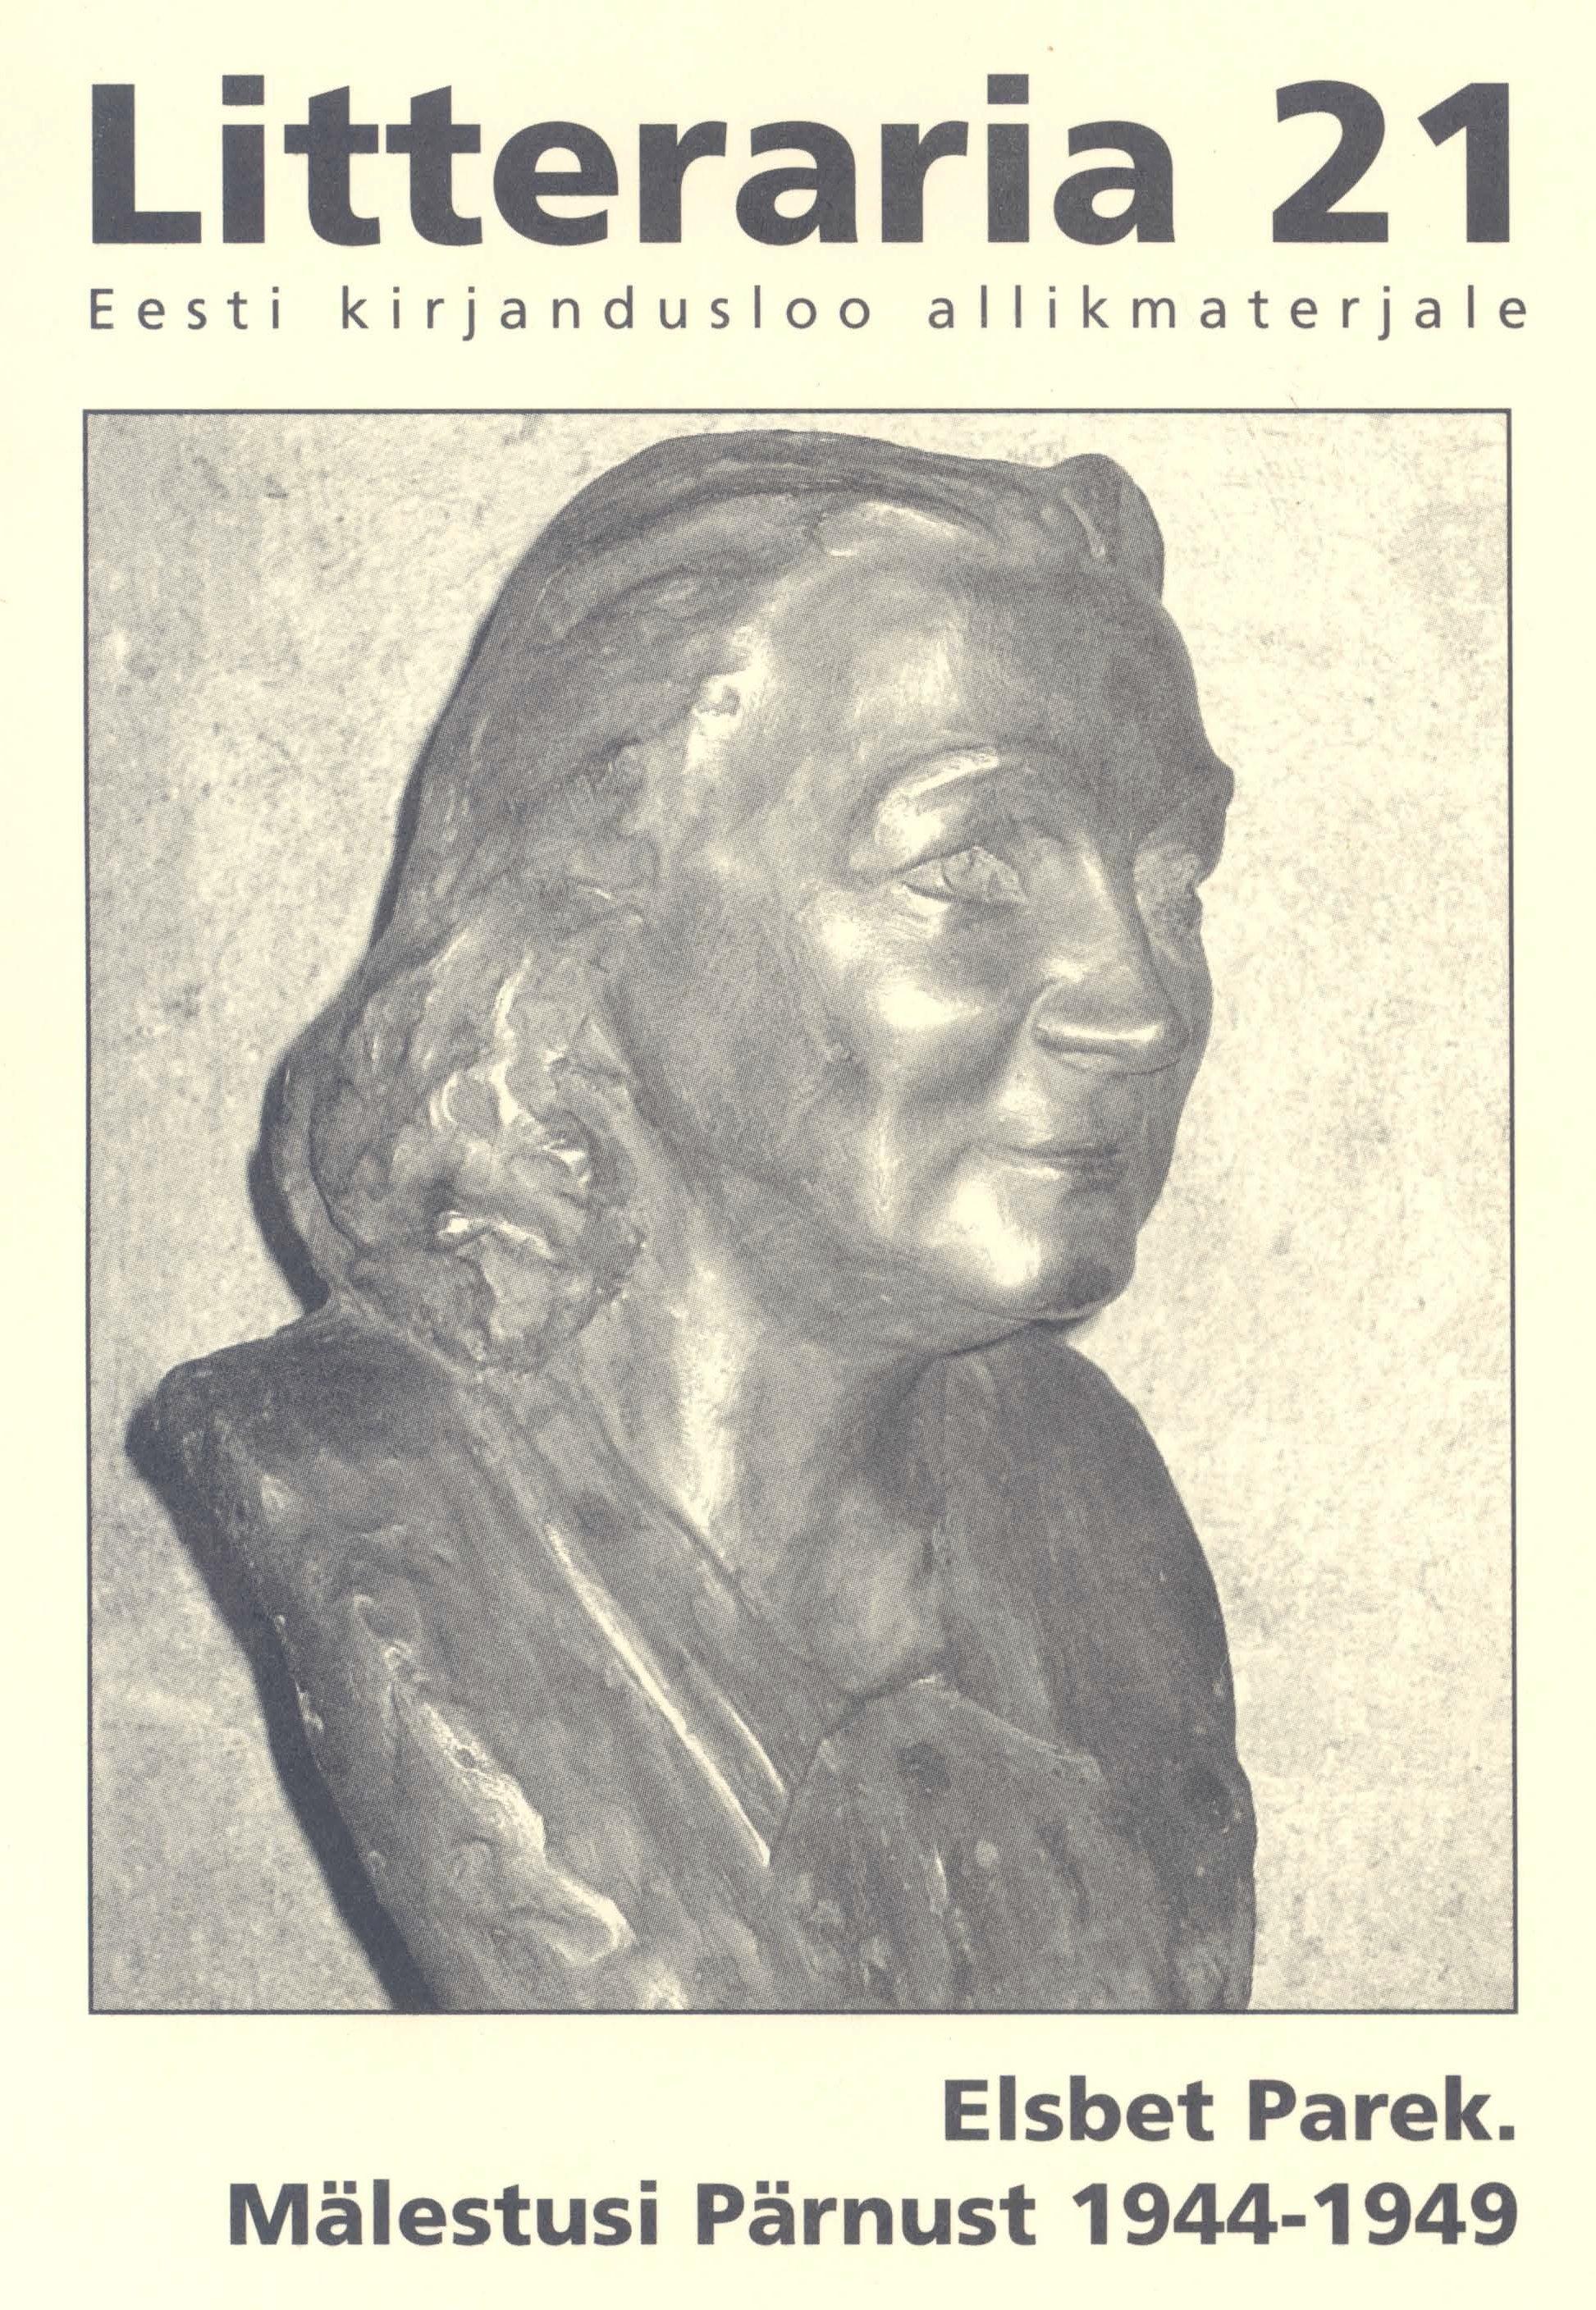 Elsbet Parek «Litteraria» sari. Mälestusi Pärnust 1944-1949 elsbet parek litteraria sari tartu – minu ülikoolilinn 1922 1926